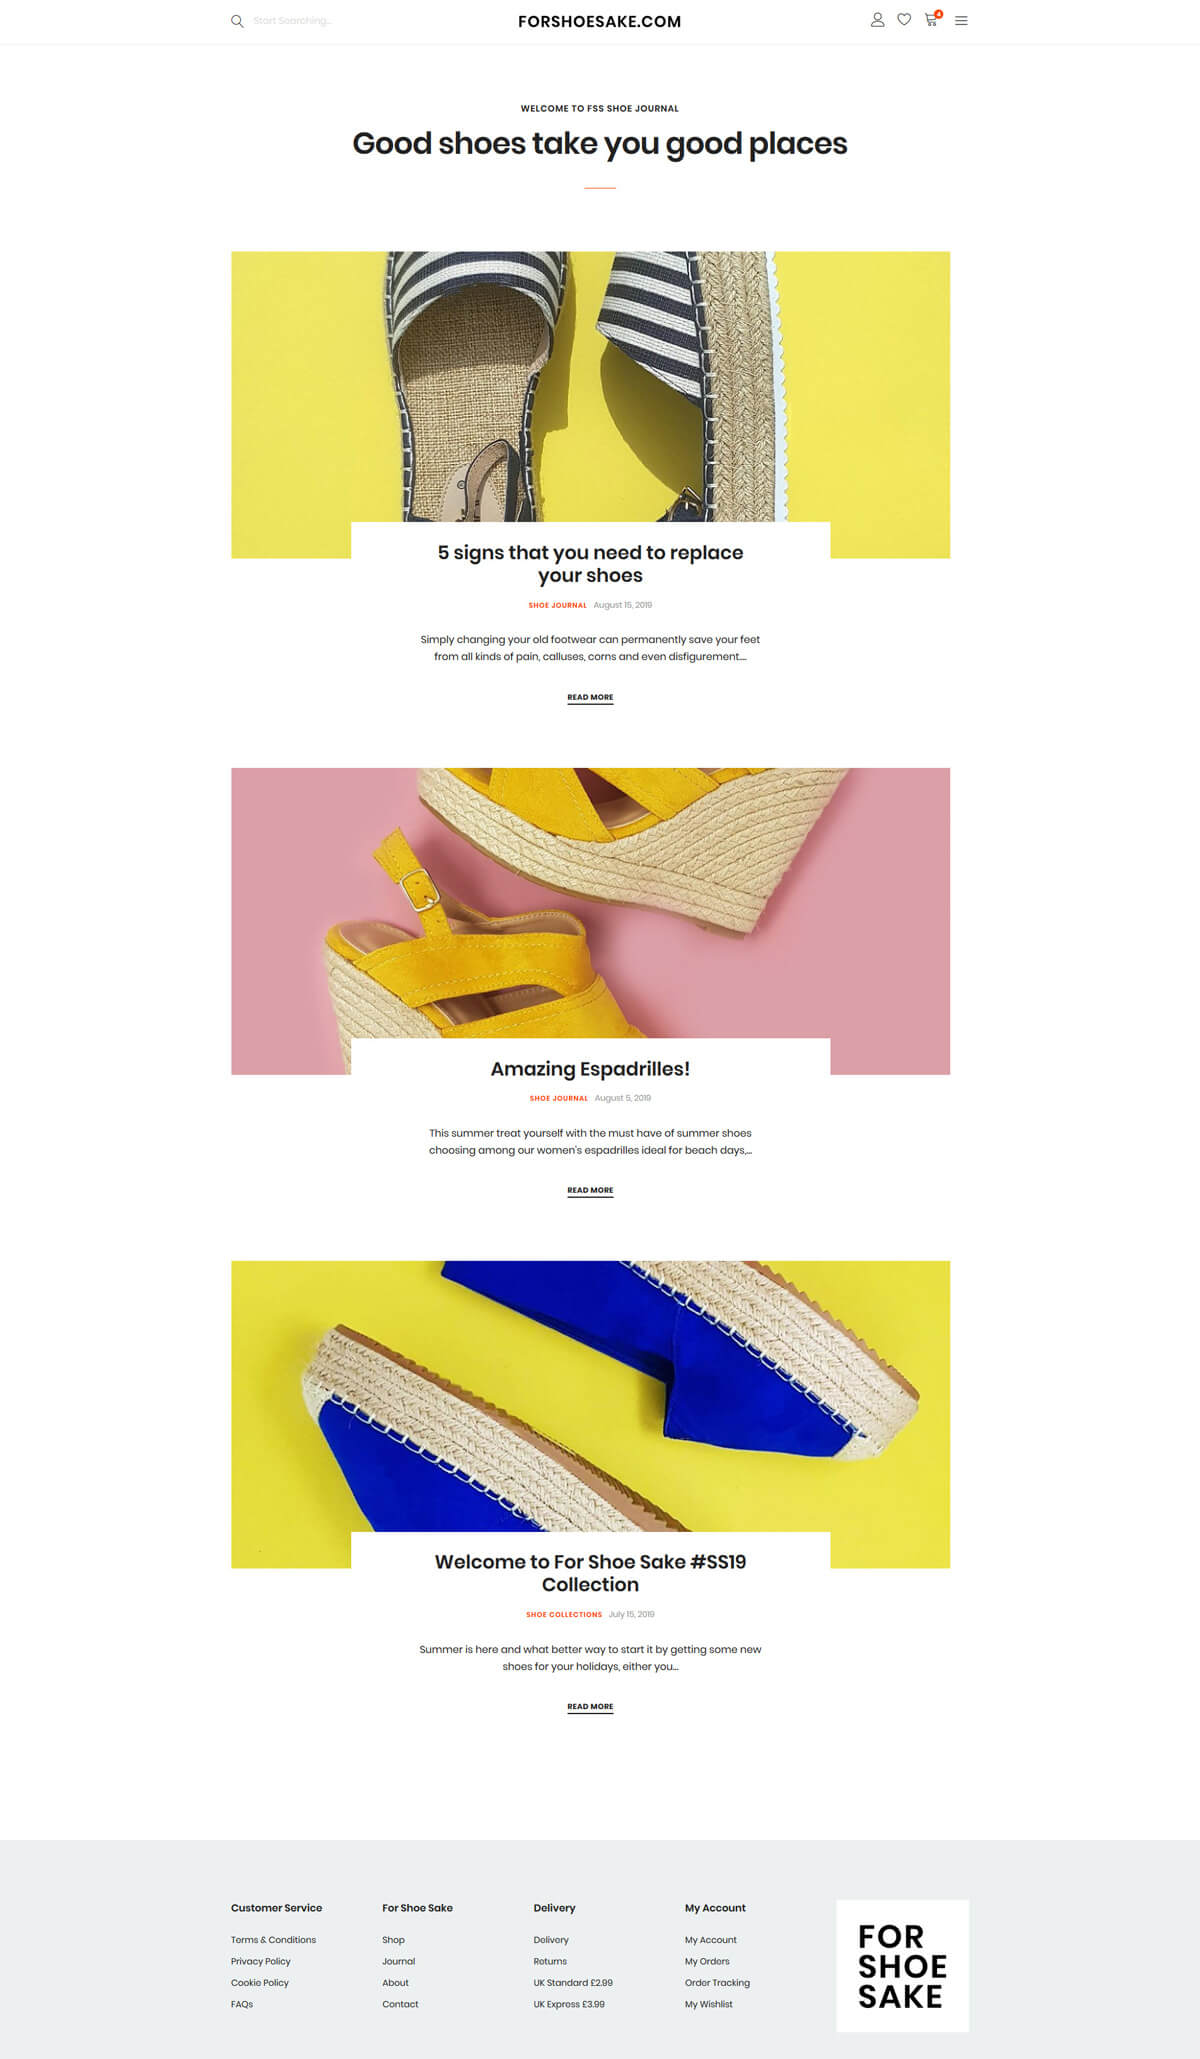 For Shoe Sake - forshoesake.com - Case Study 3 - developed by Digital Artifacts Creative